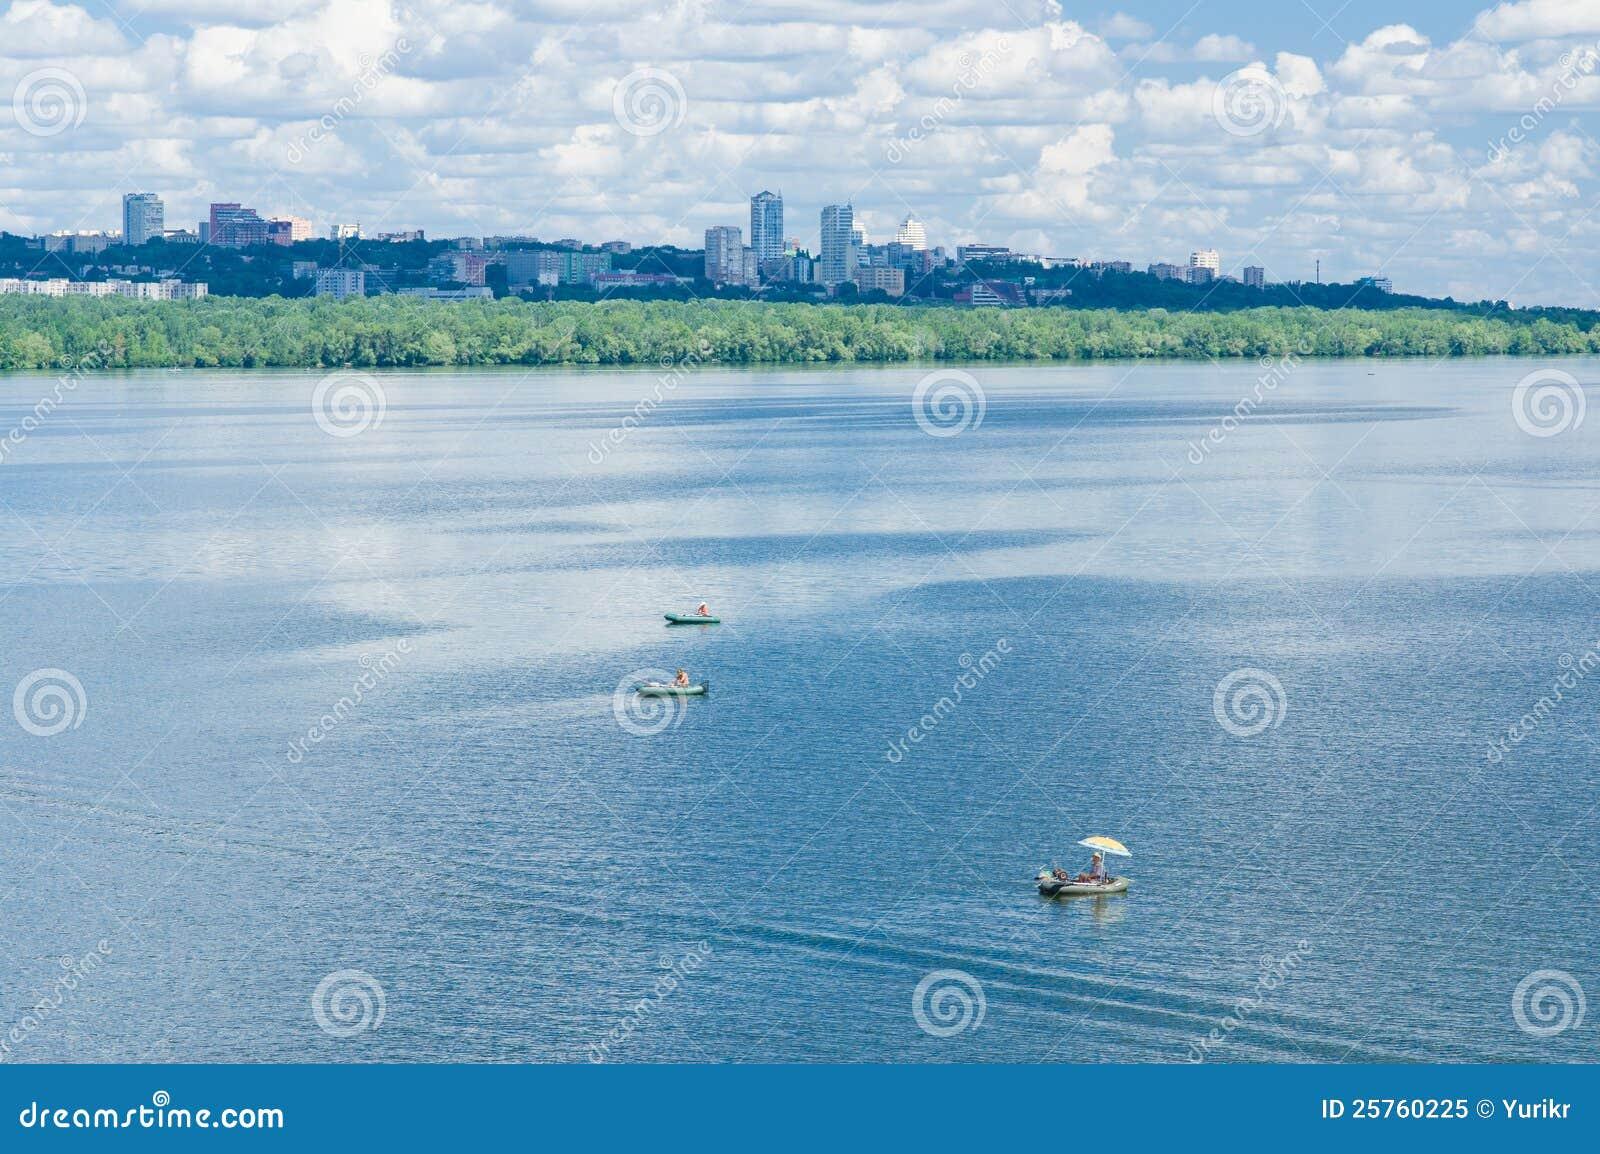 Summer landscape with big river Dnepr